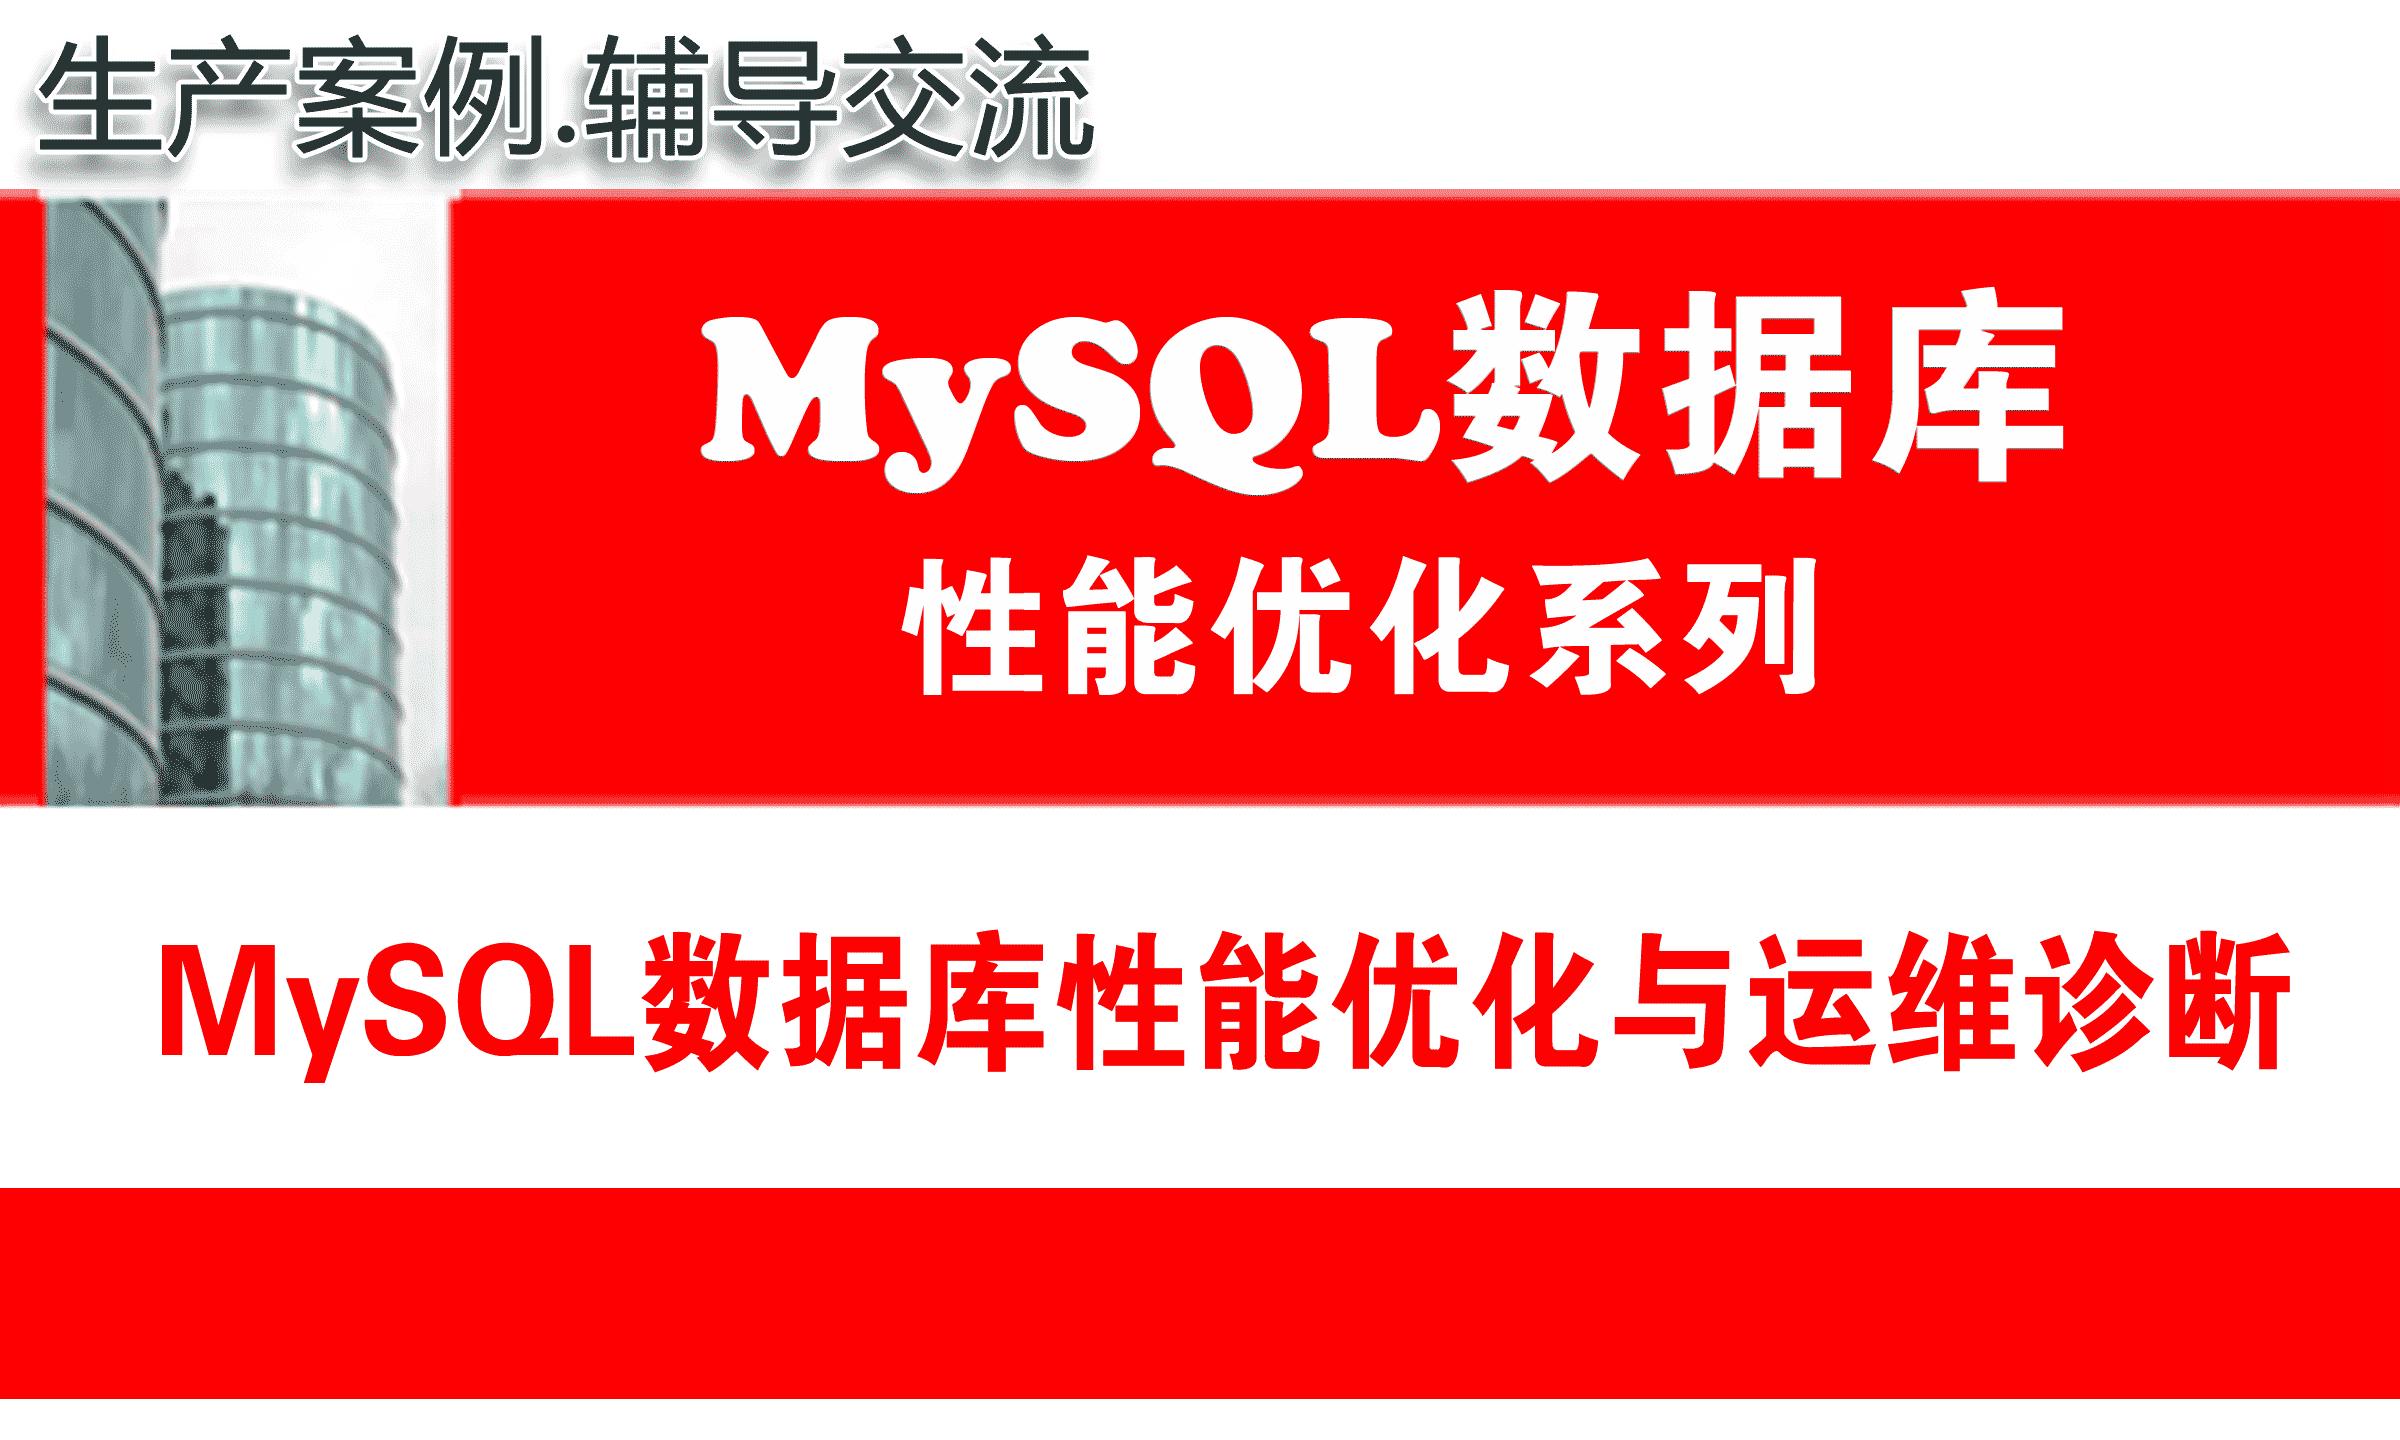 MySQL教程(第七月):MySQL数据库性能优化与运维诊断